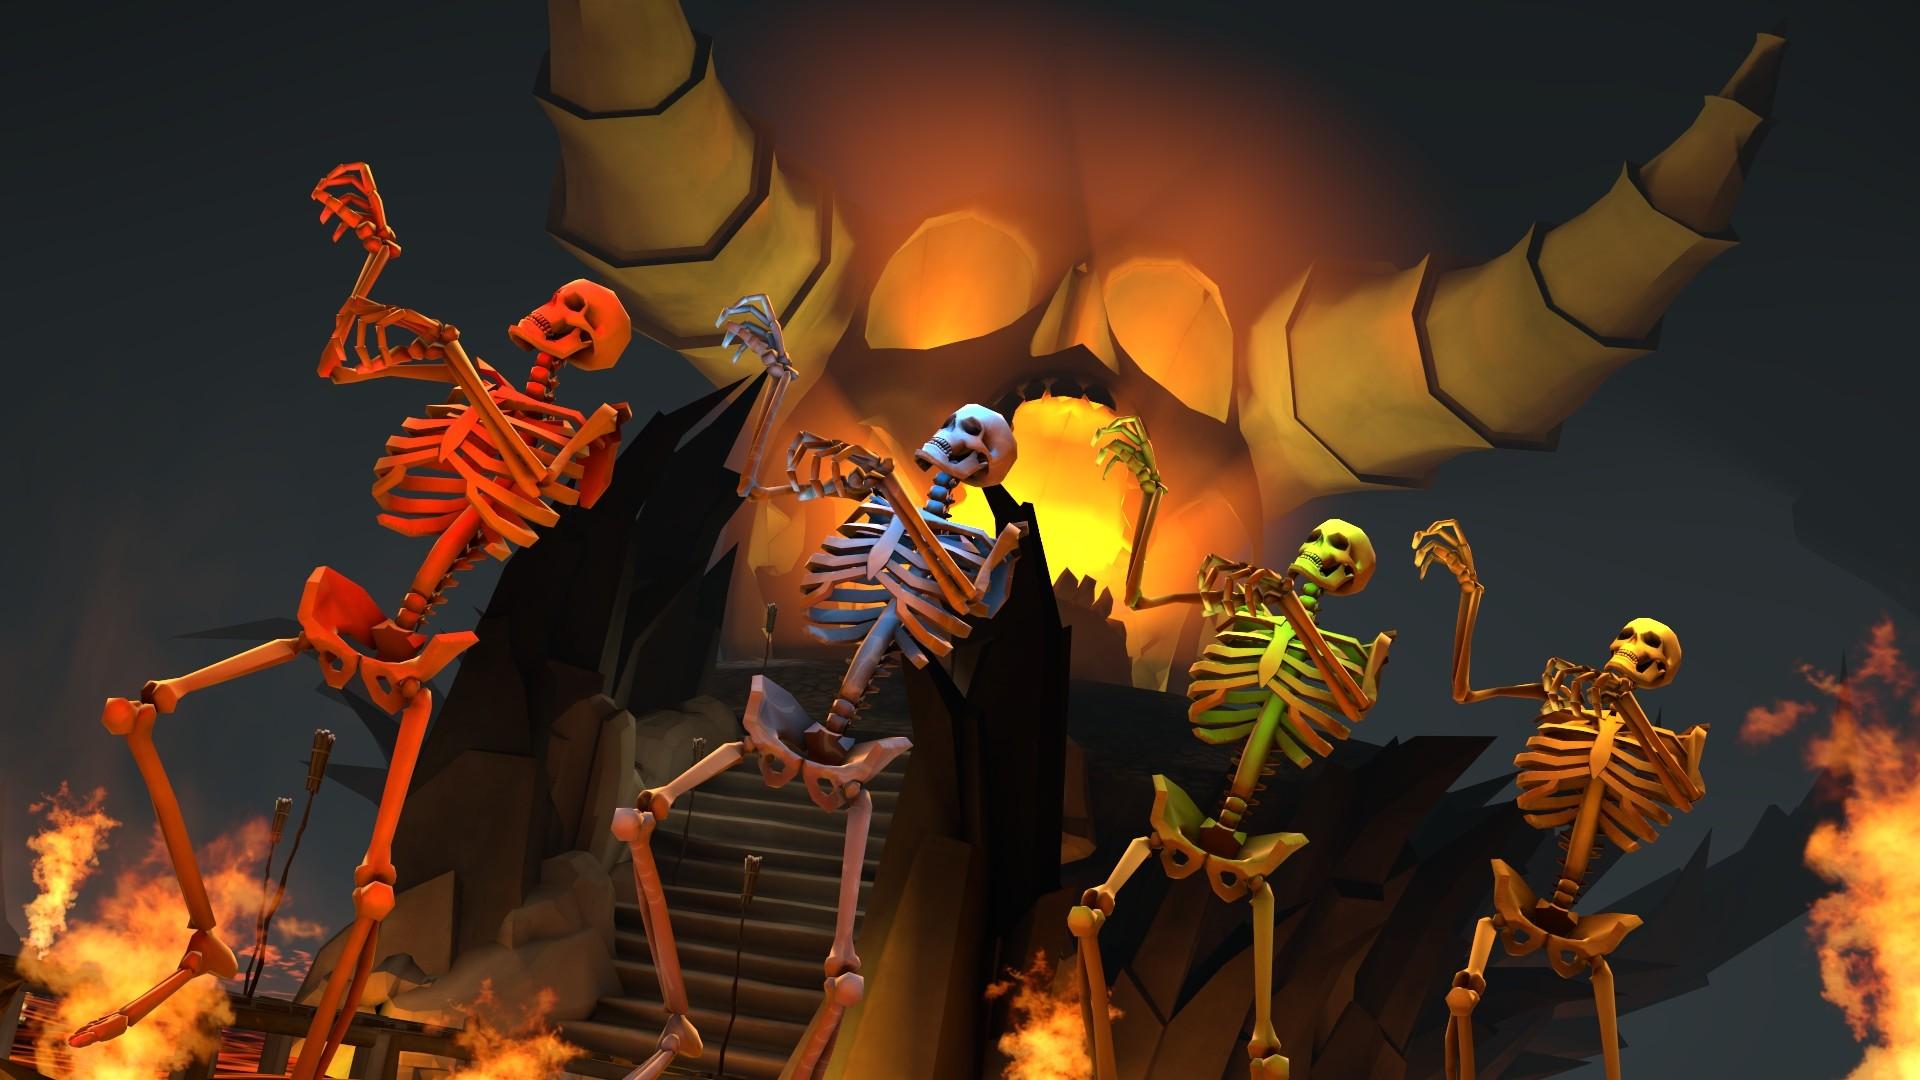 … Spooky Scary Skeletons. by RayDraca